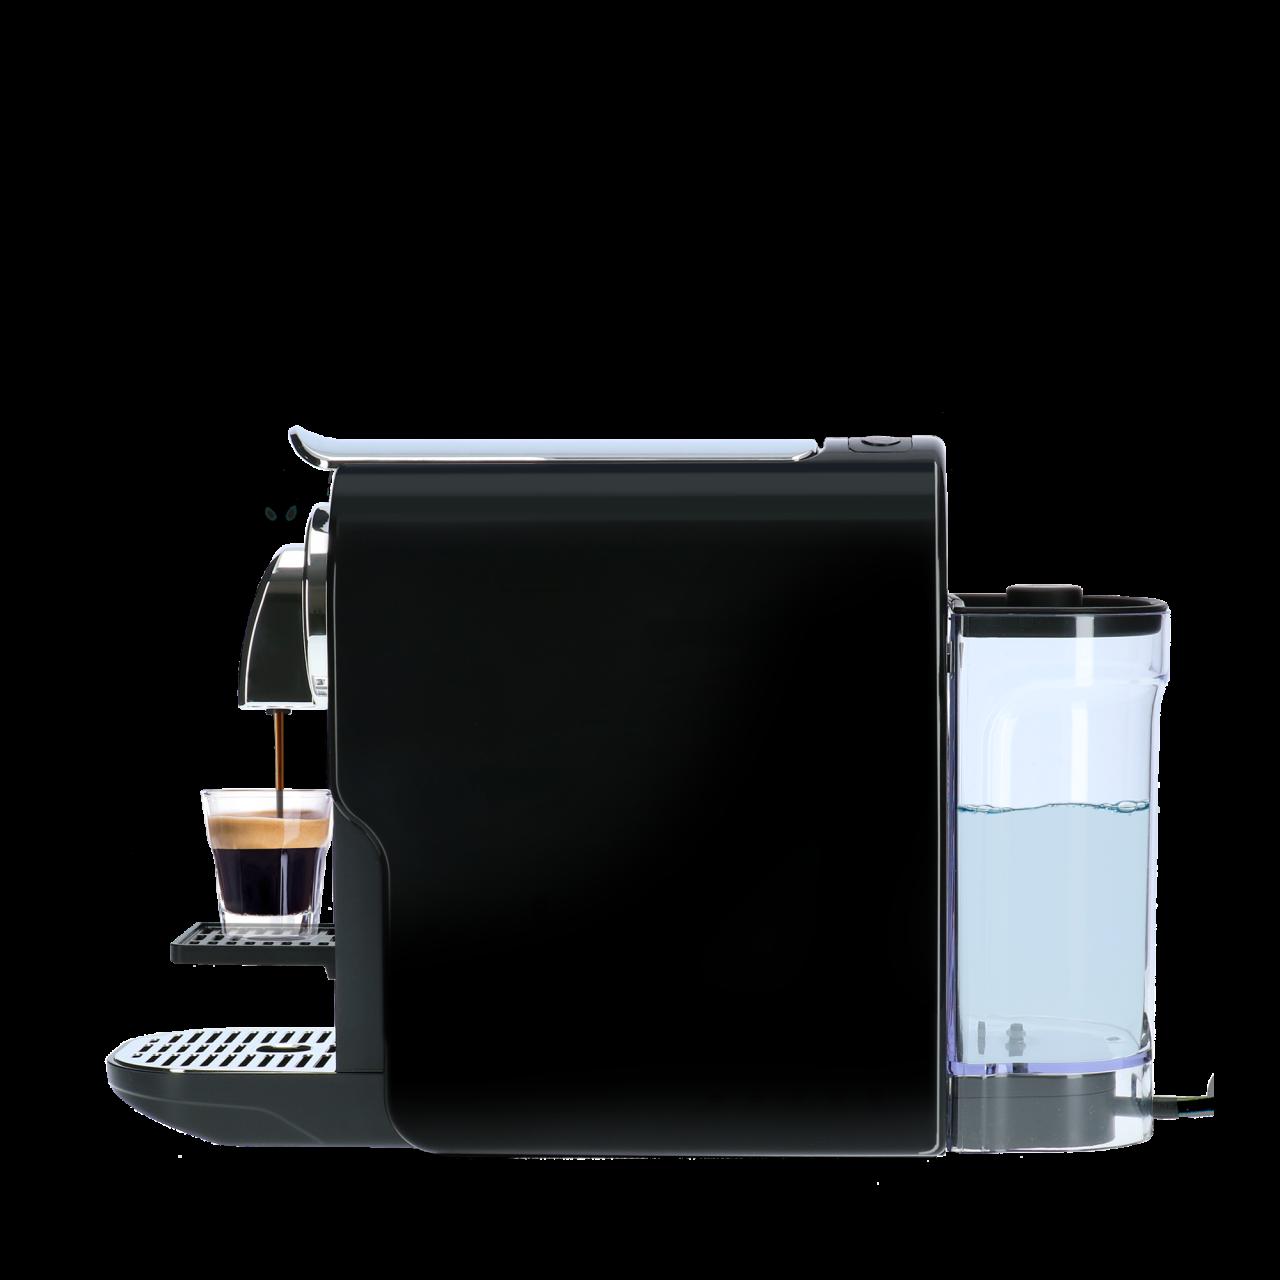 Mestic Koffie Cup Machine ME-80